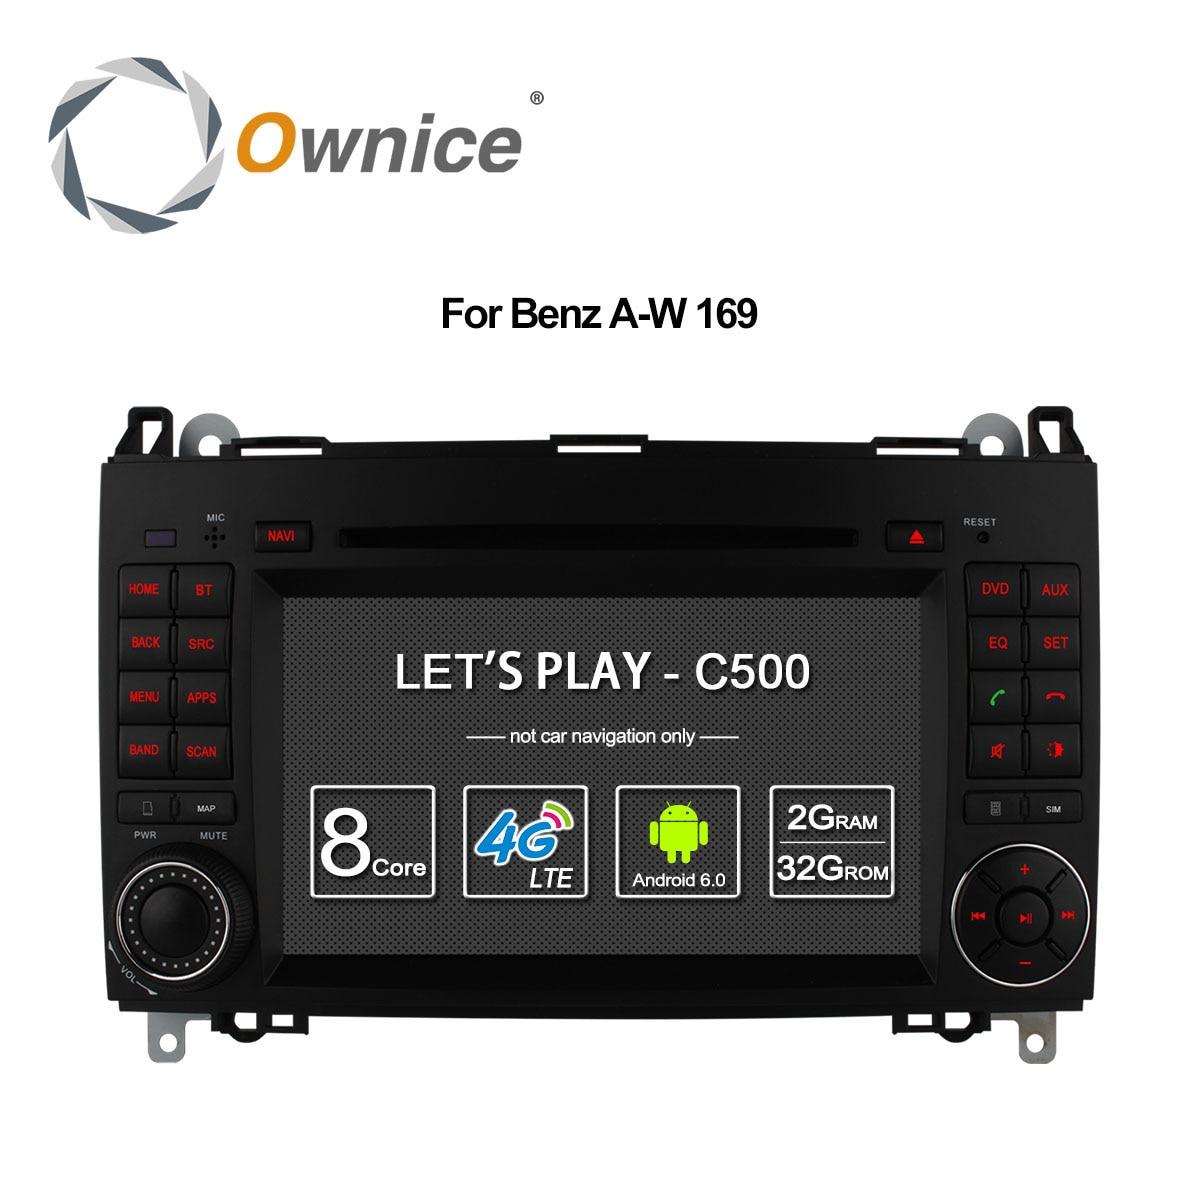 Ownice 4G LTE SIM Android6.0 8 Núcleo 32G ROM DVD Do GPS Do Carro Navi Para Mercedes-classe A W169 W245 Viano Vito Sprinter W209 Crafter LT3